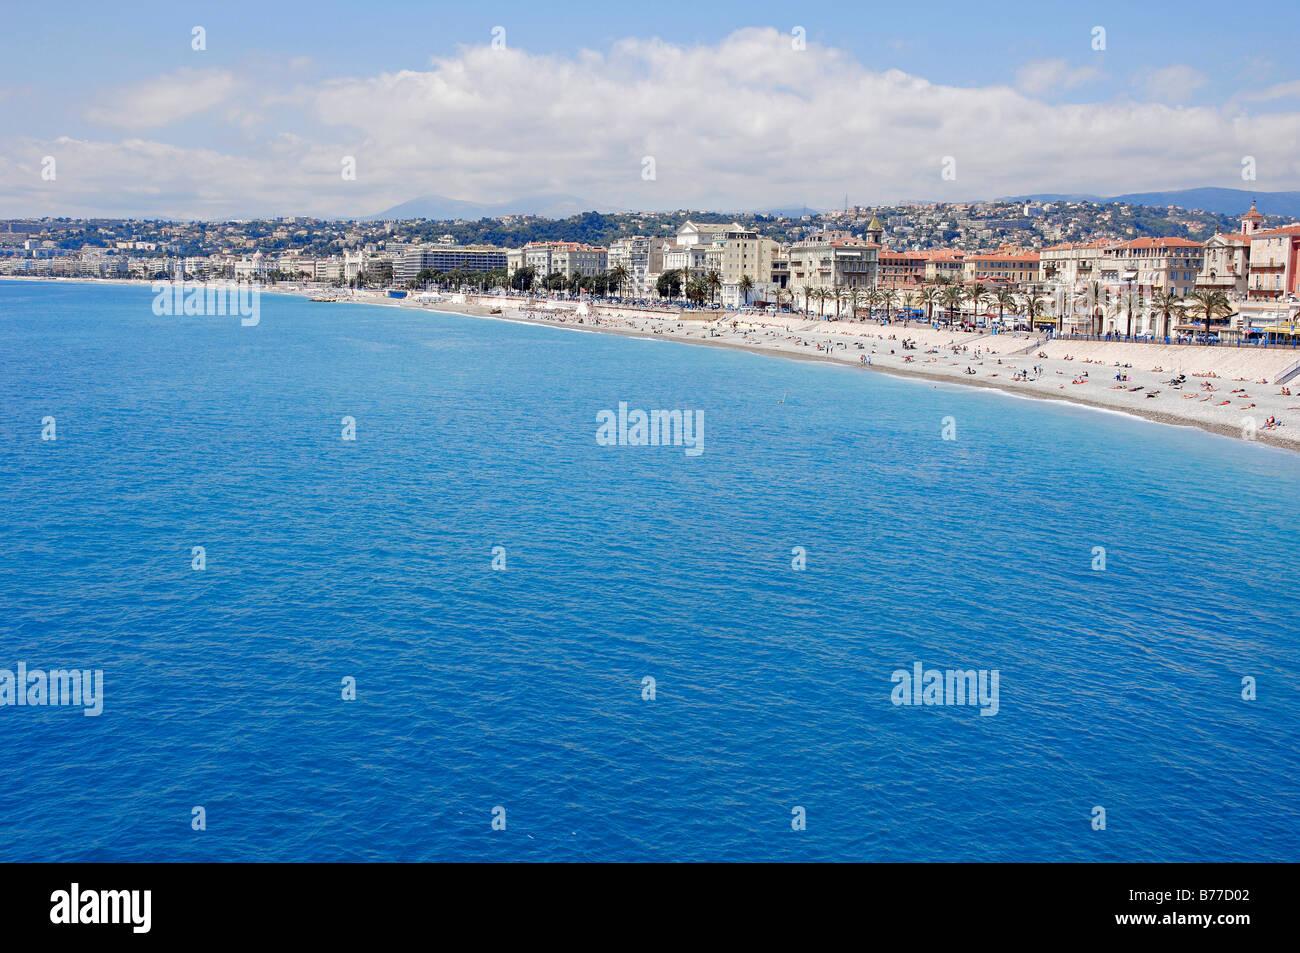 Beach, Nice, Alpes-Maritimes, Provence-Alpes-Cote d'Azur, Southern France, France, Europe - Stock Image